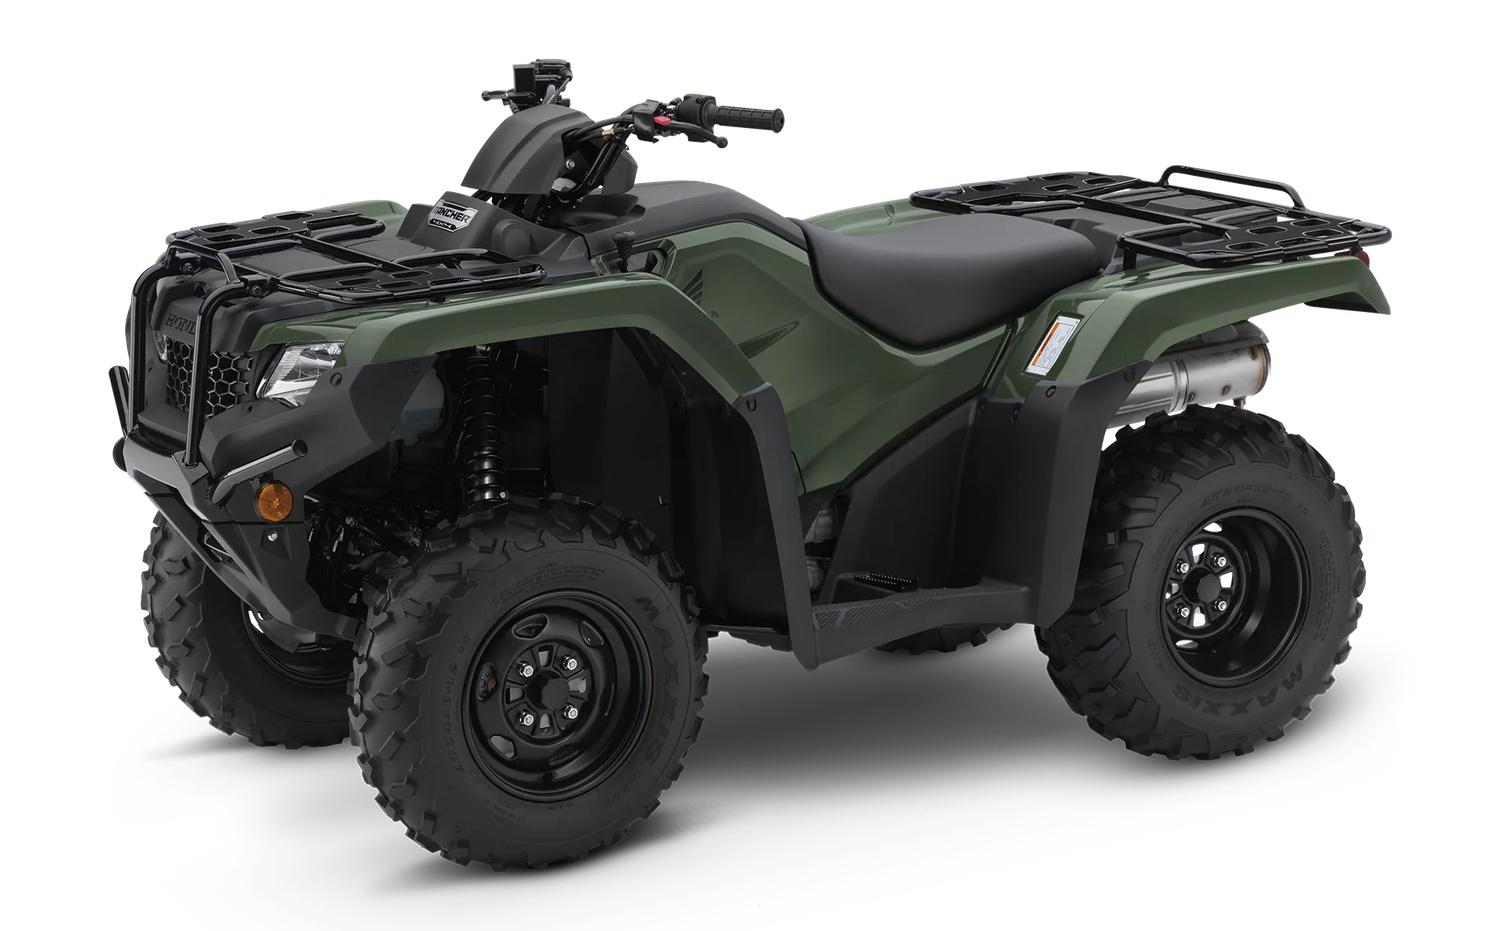 2022 Honda TRX420 Rancher Frais inclus+Taxes